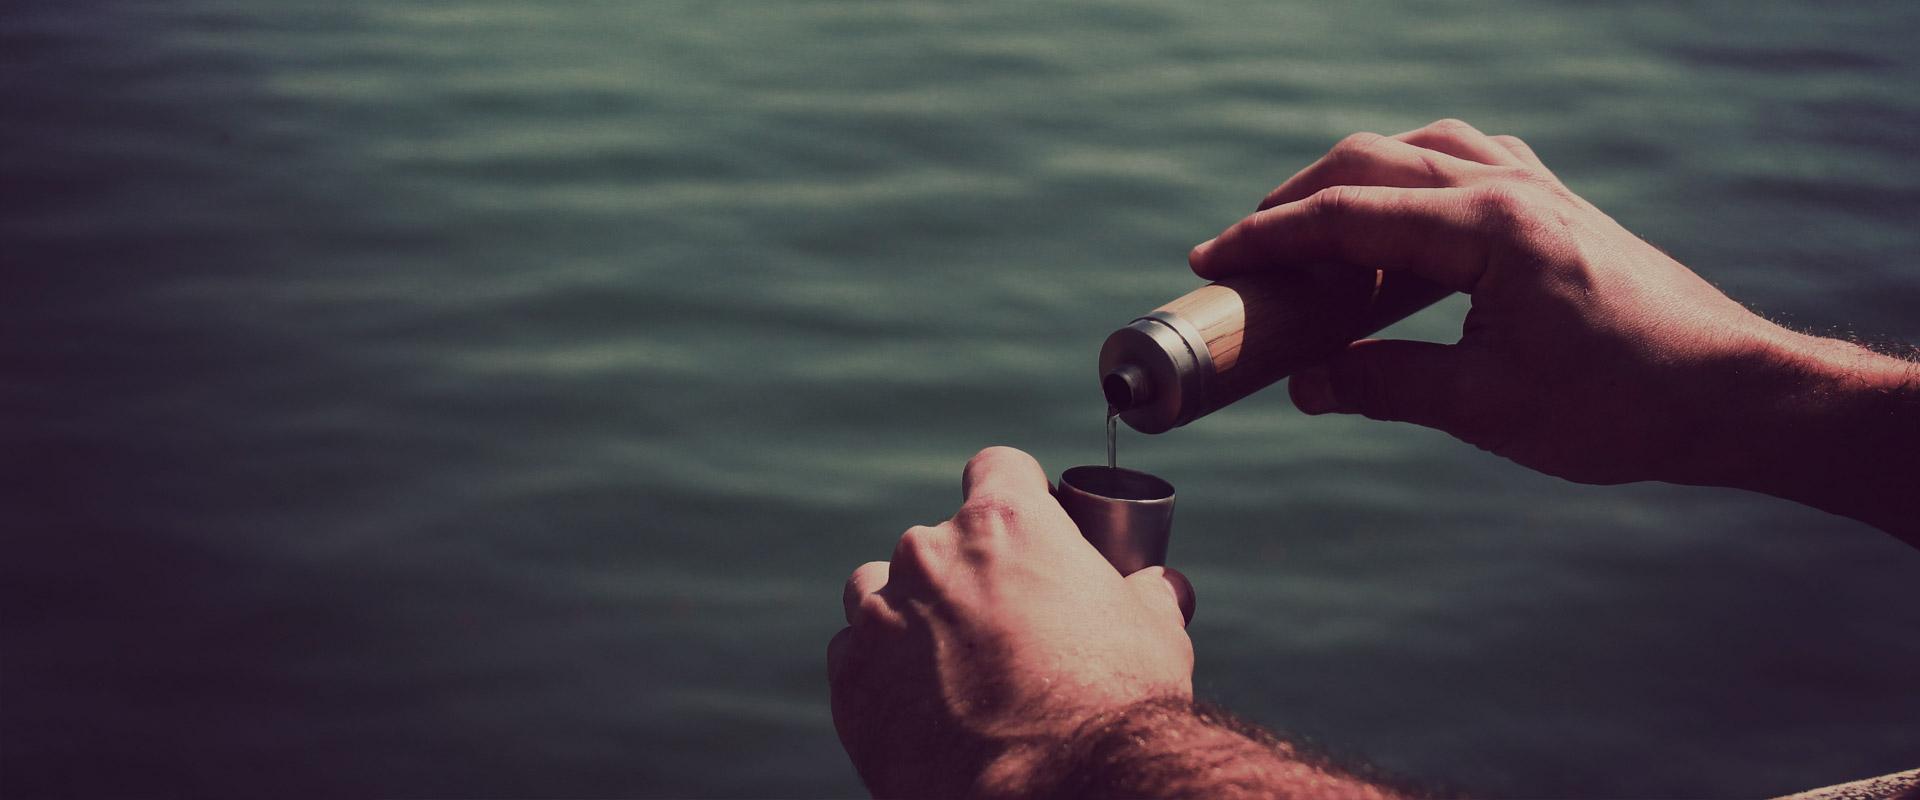 Kole-flask-hisheji (6)